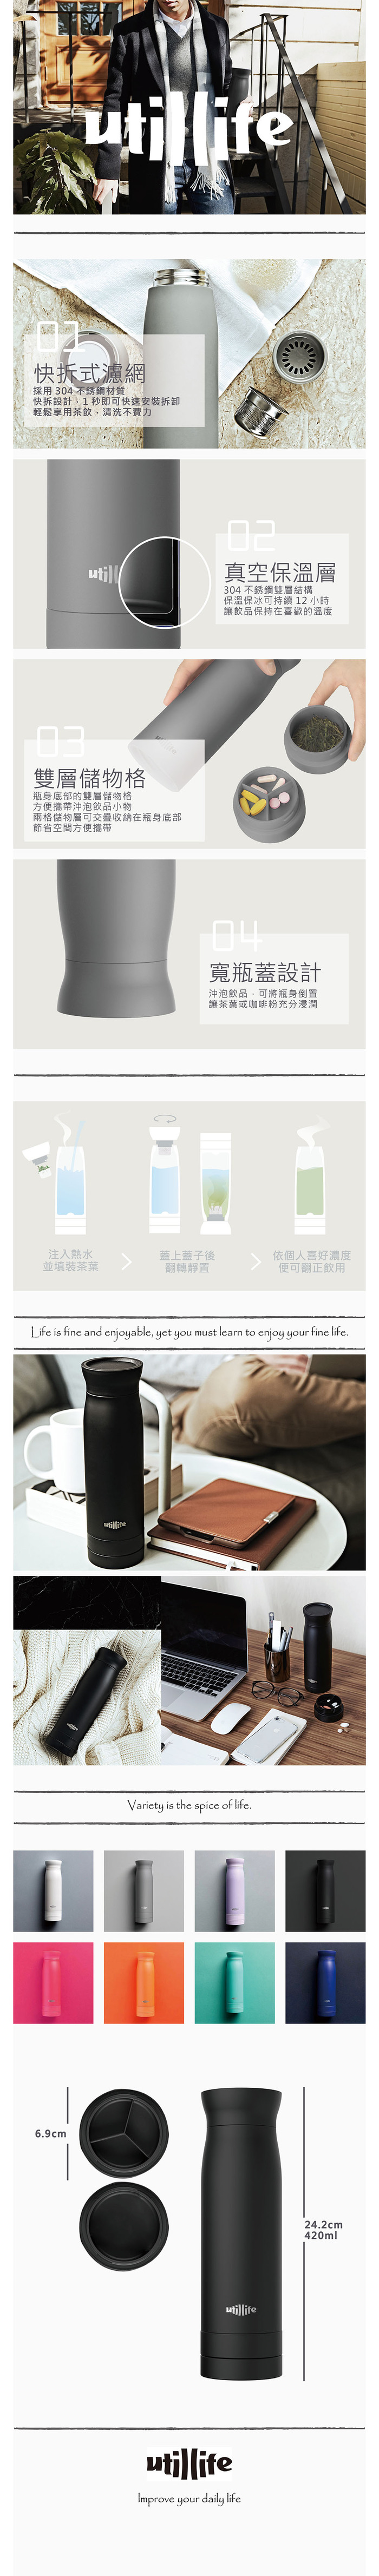 Utillife |輕盈收納304不銹鋼保溫瓶(420ml) - 黑色